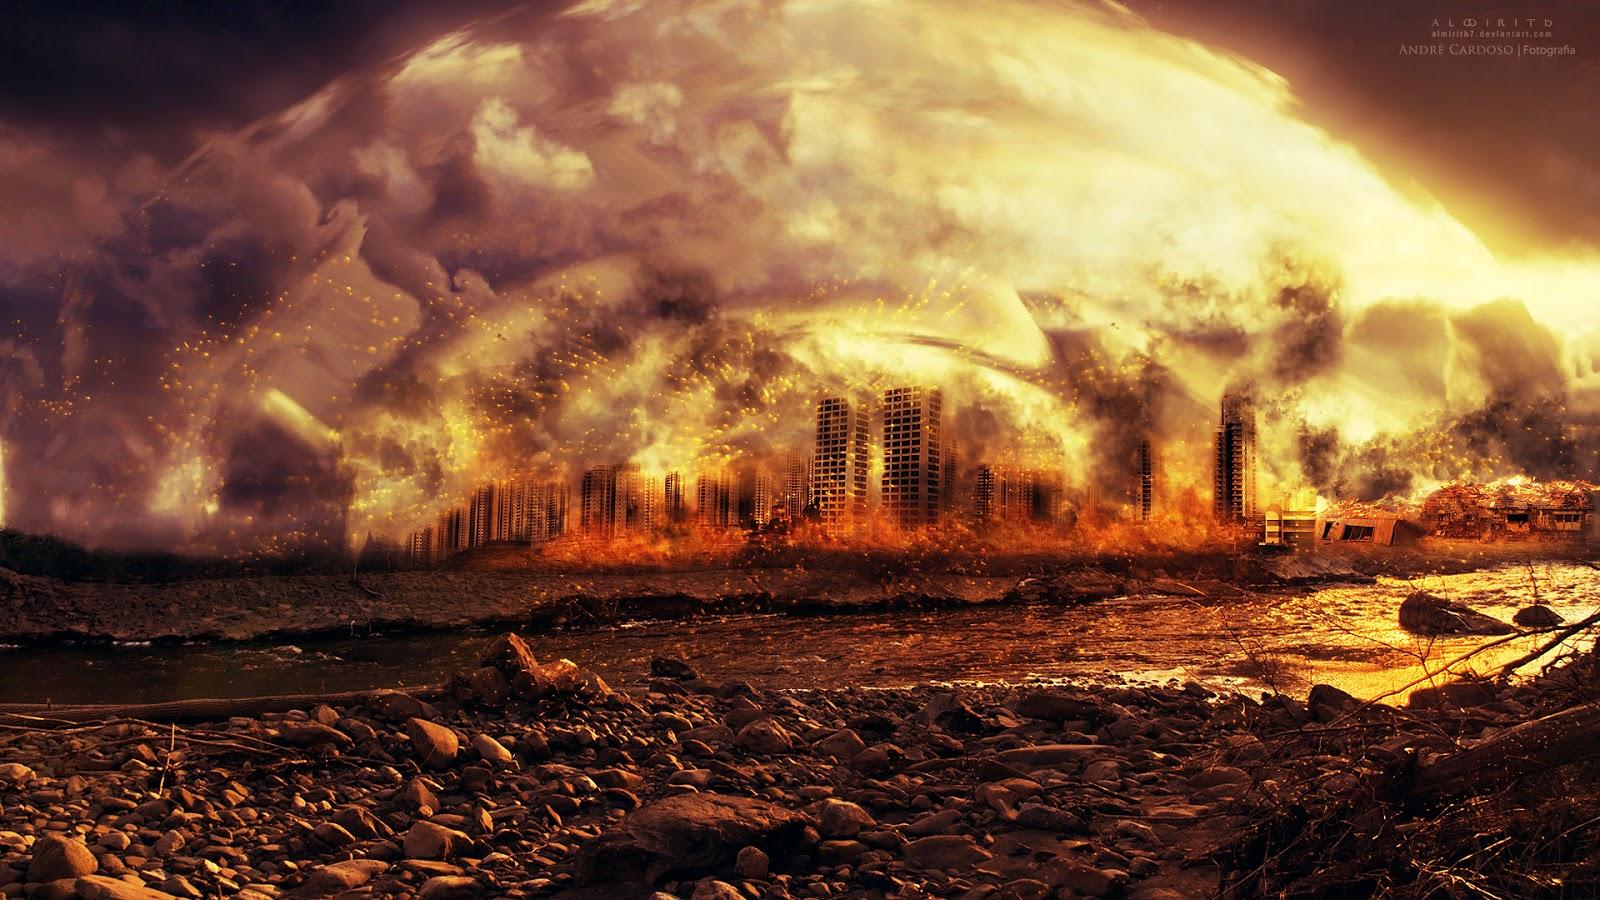 A menina, Marx e o apocalipse